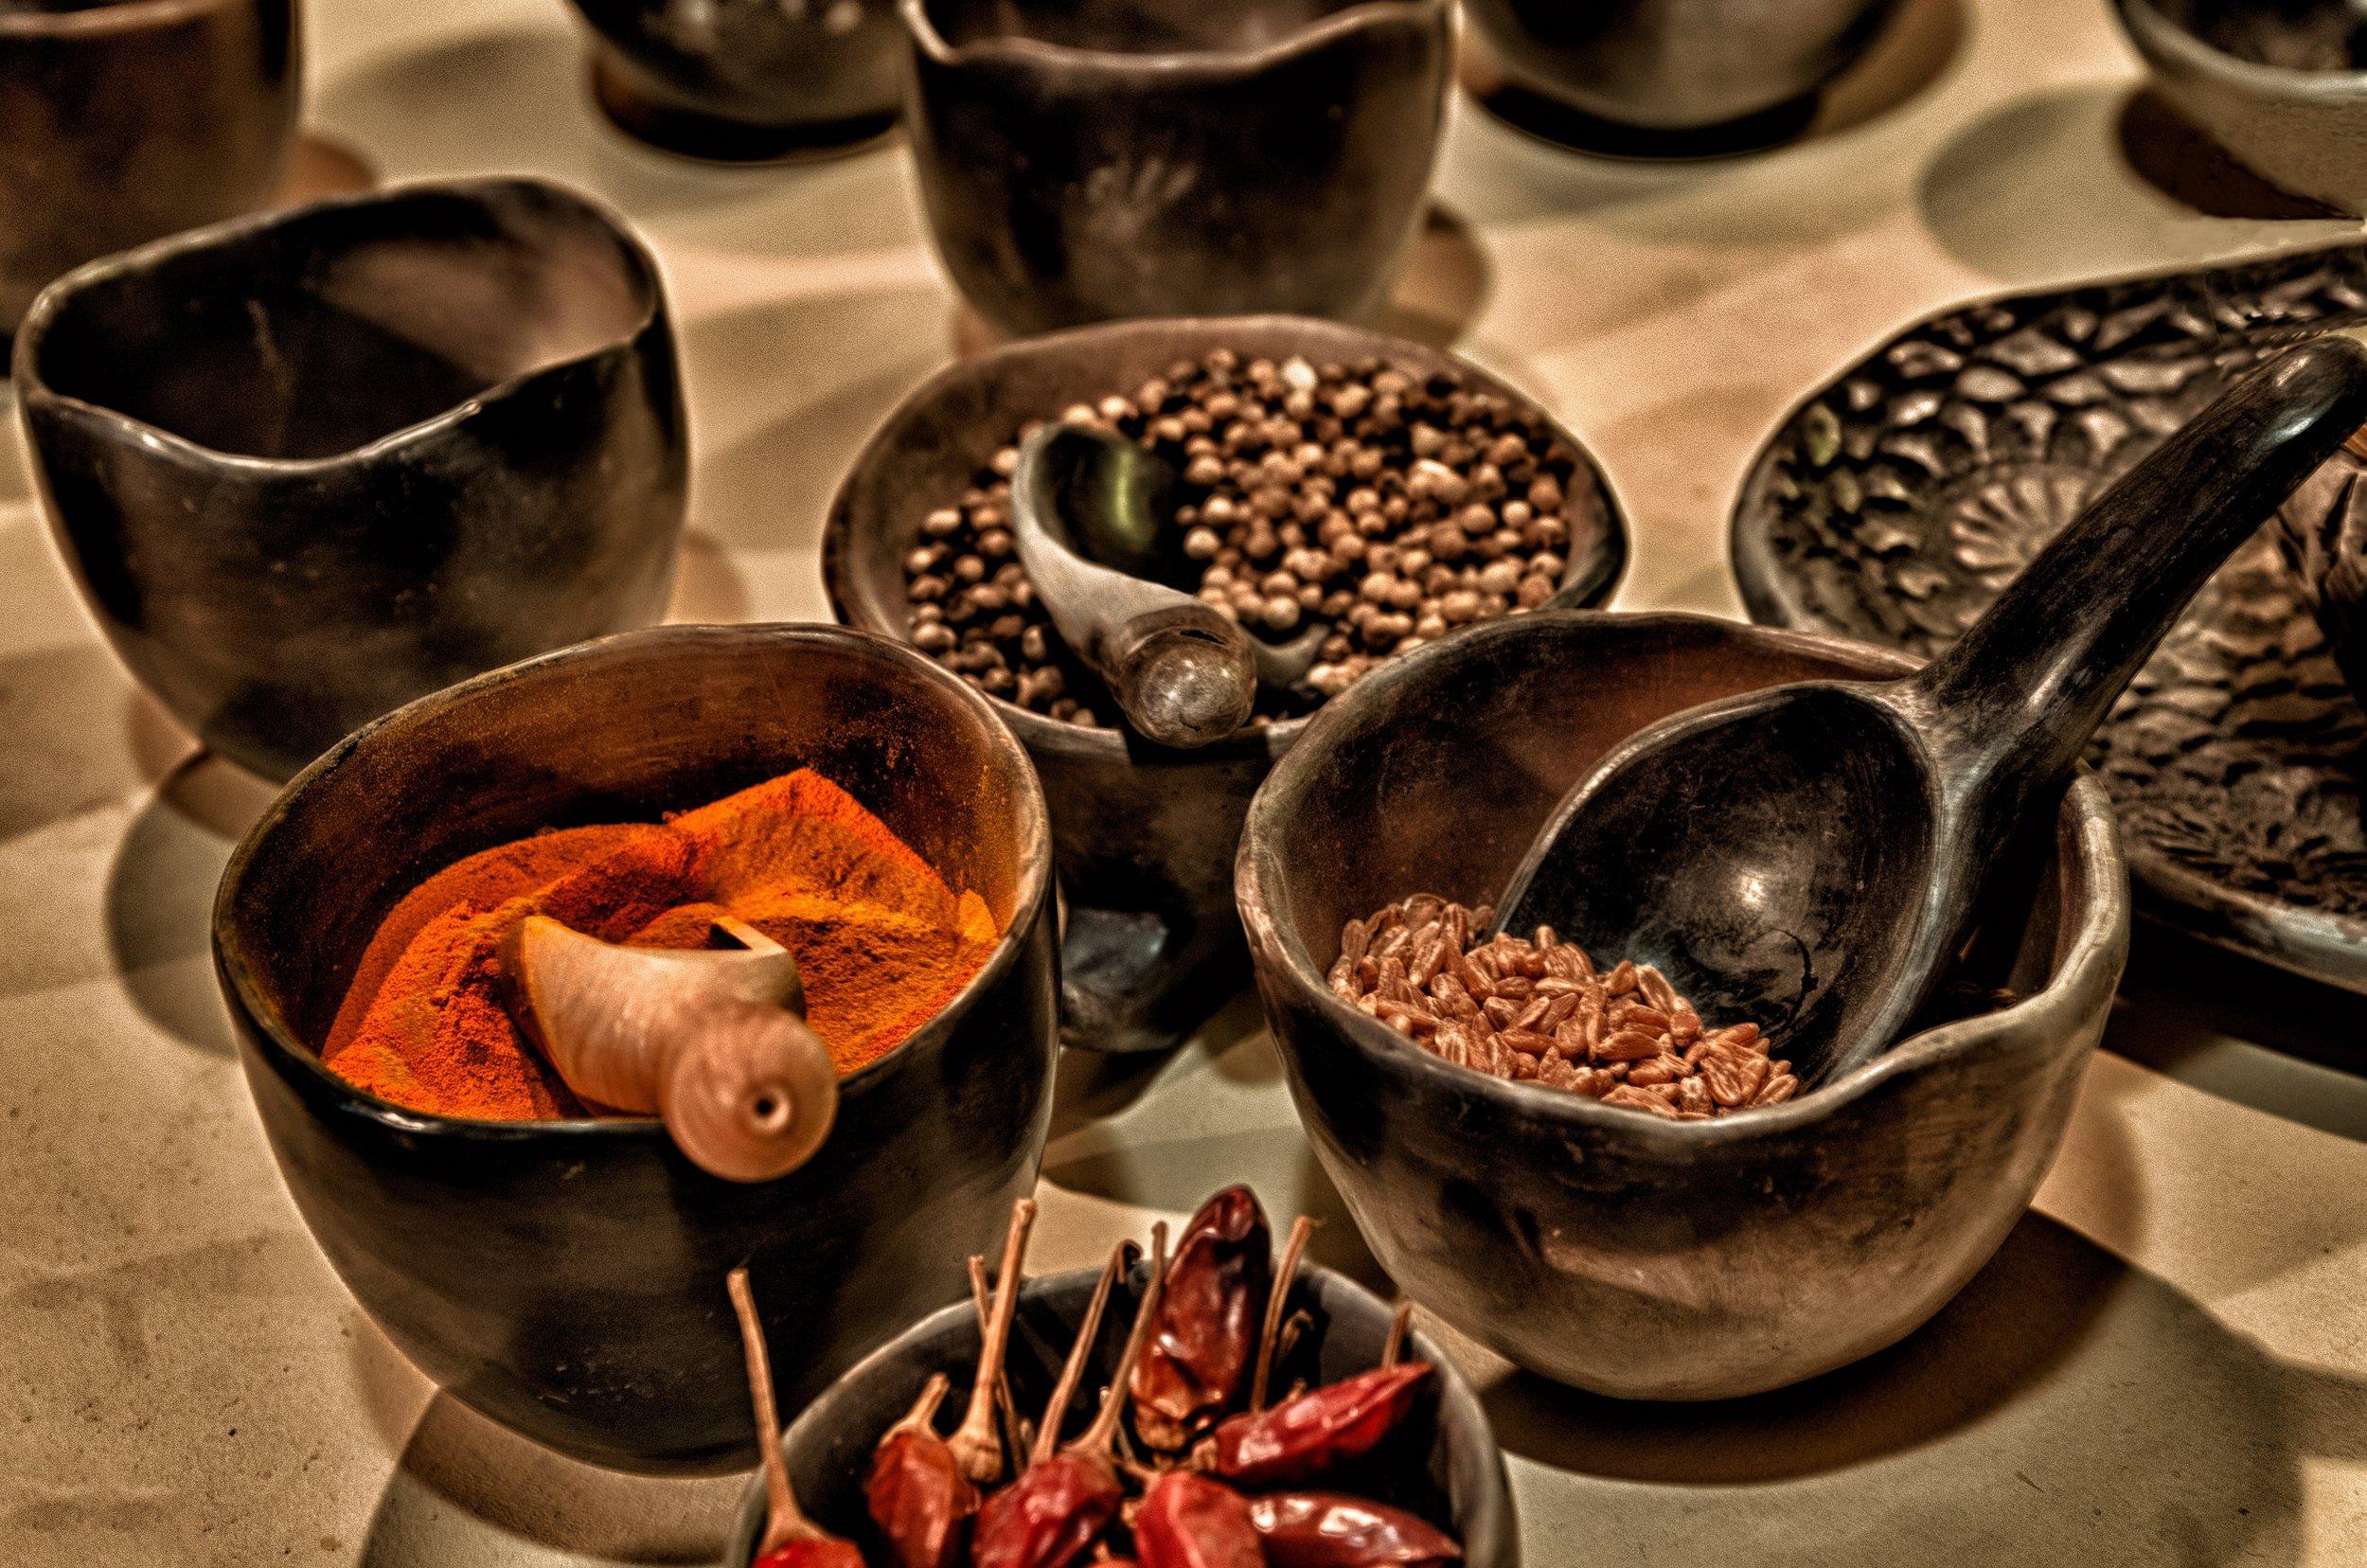 bowls-cayenne-chili-54453.jpg